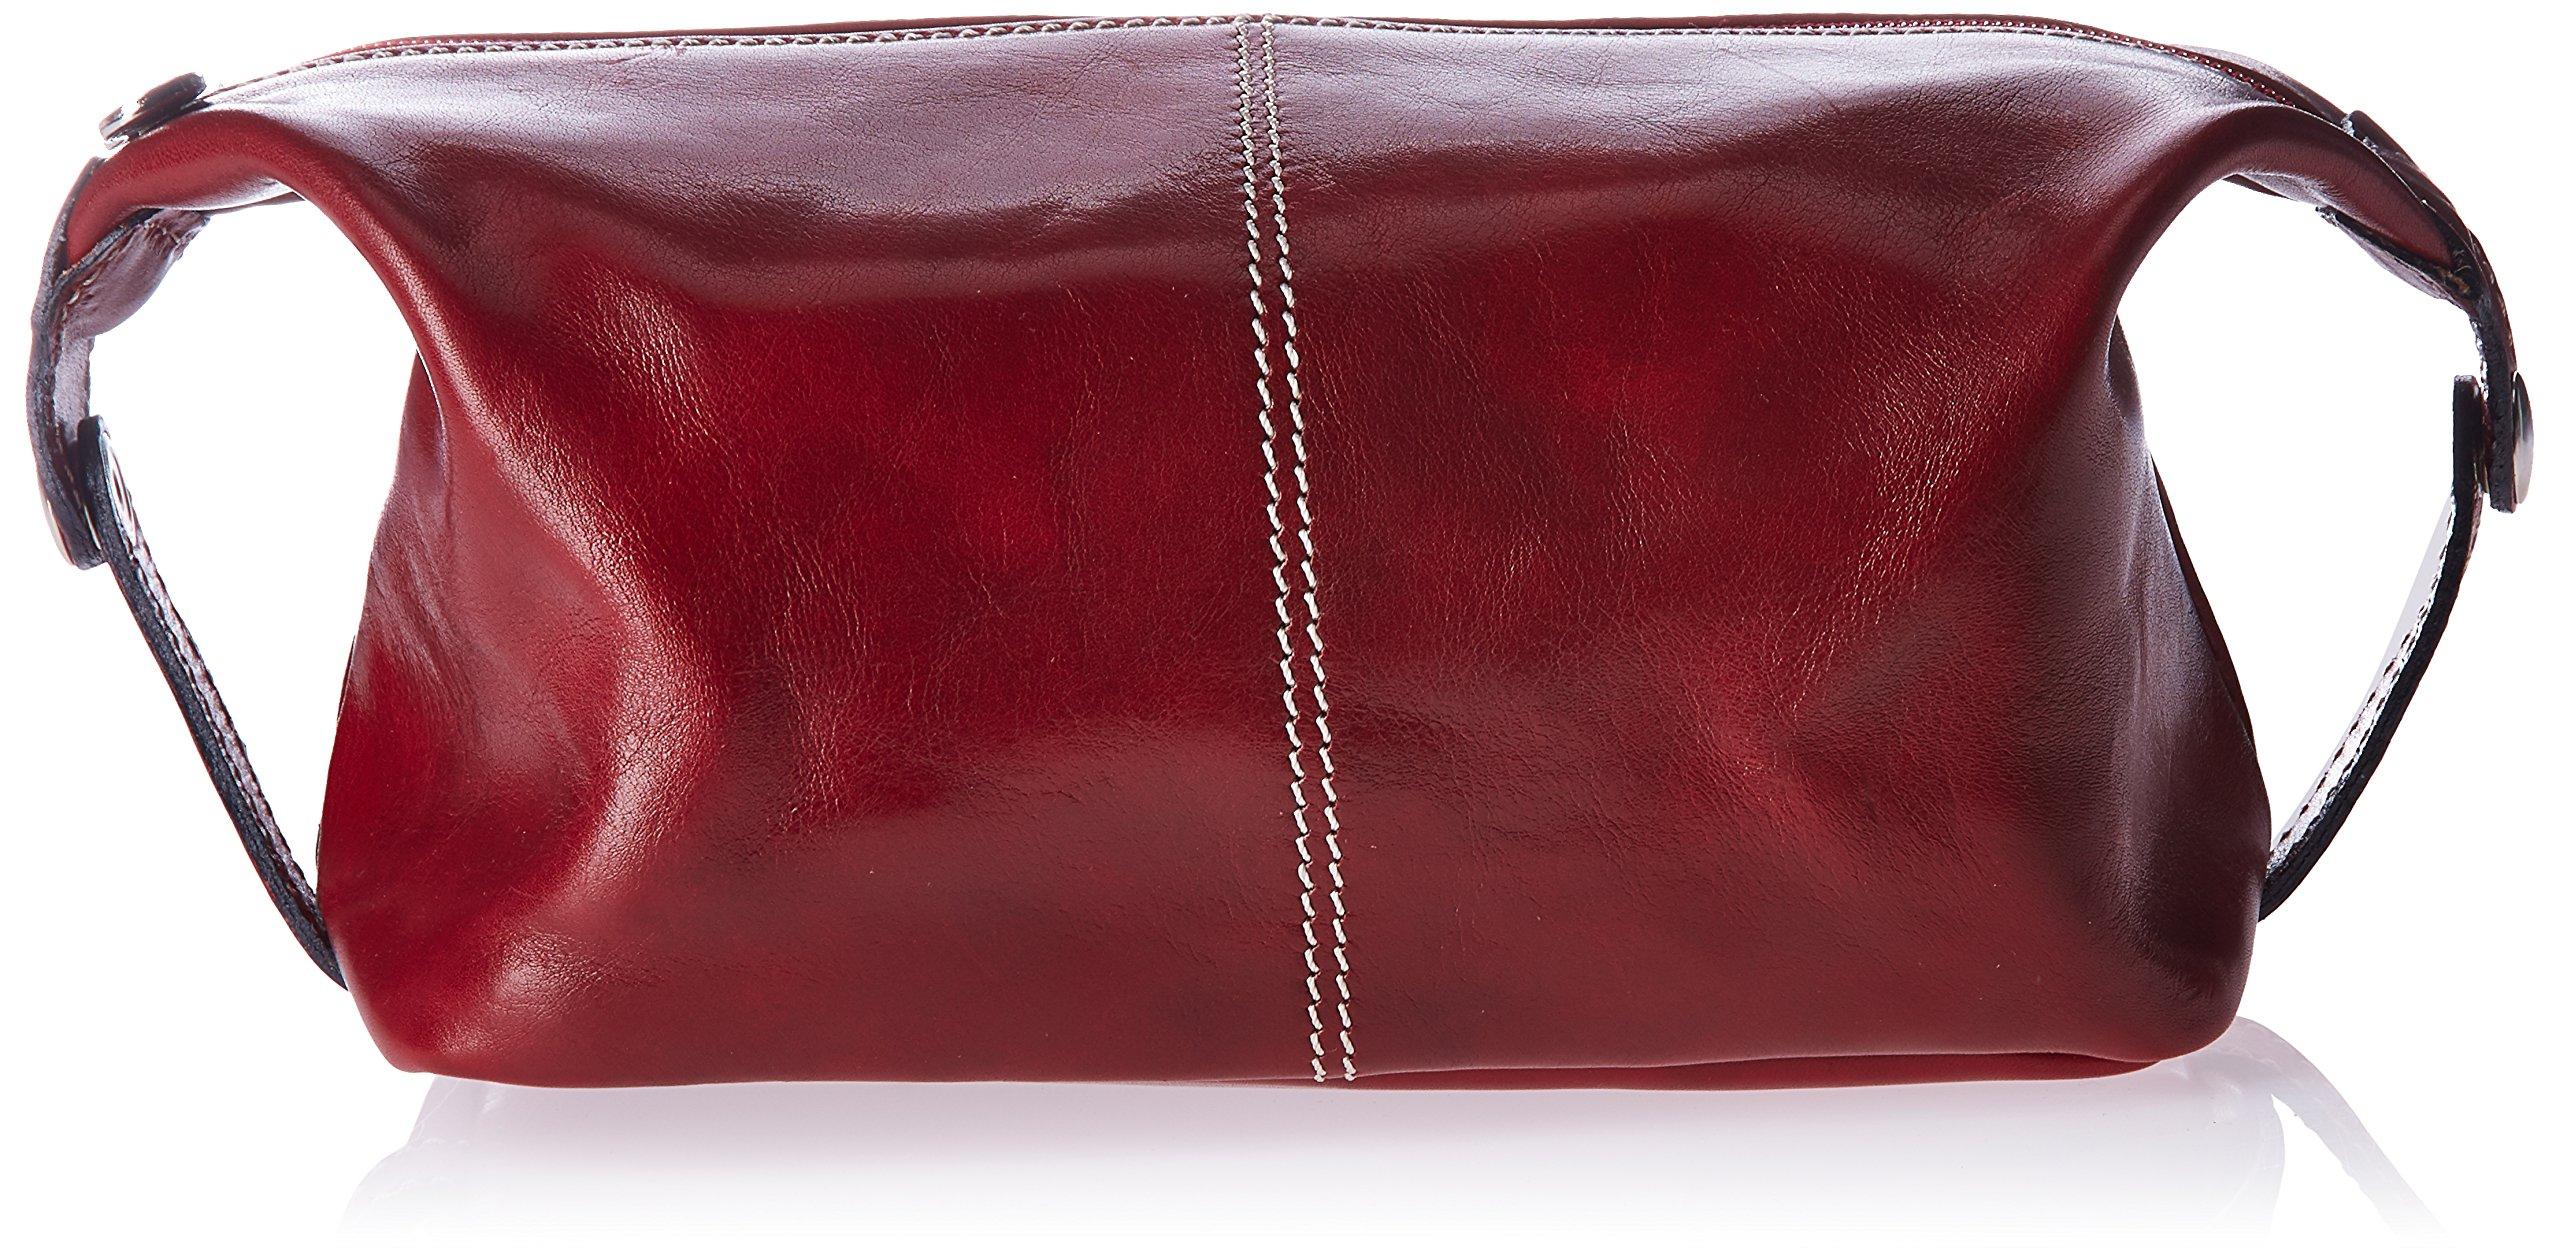 Alberto Bellucci Men's Italian Leather Toiletry Travel Dopp Kit Case, Red